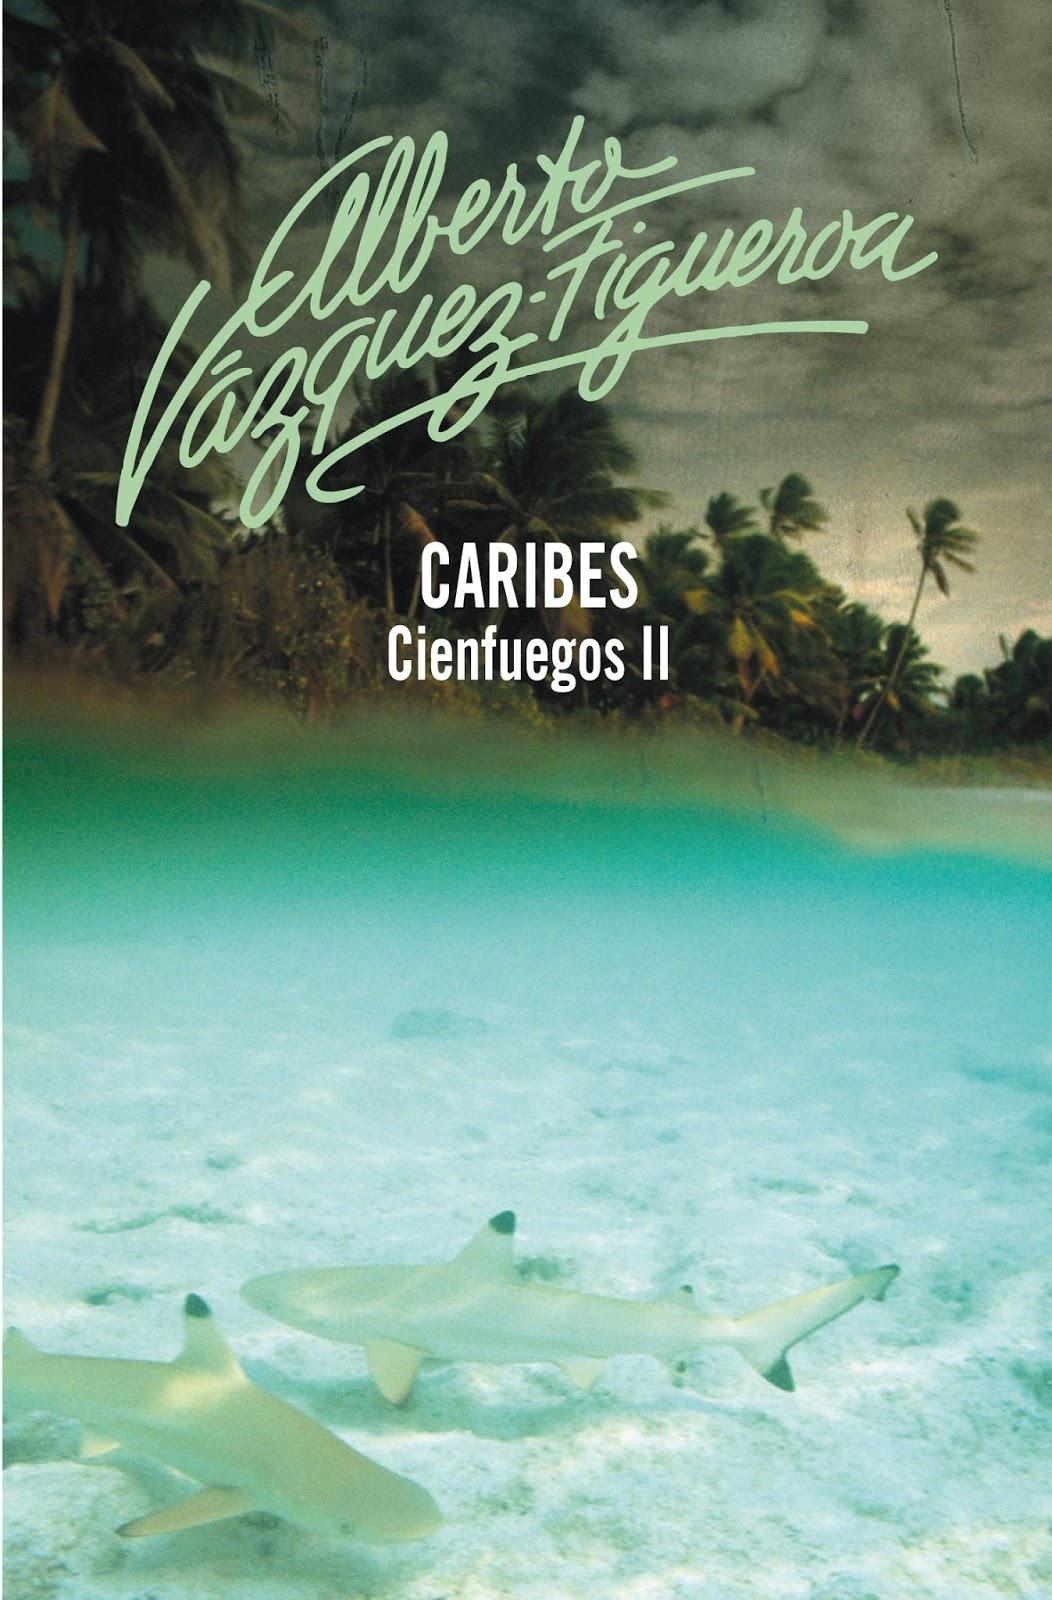 Caribes – Alberto Vázquez-Figueroa [MultiFormato]